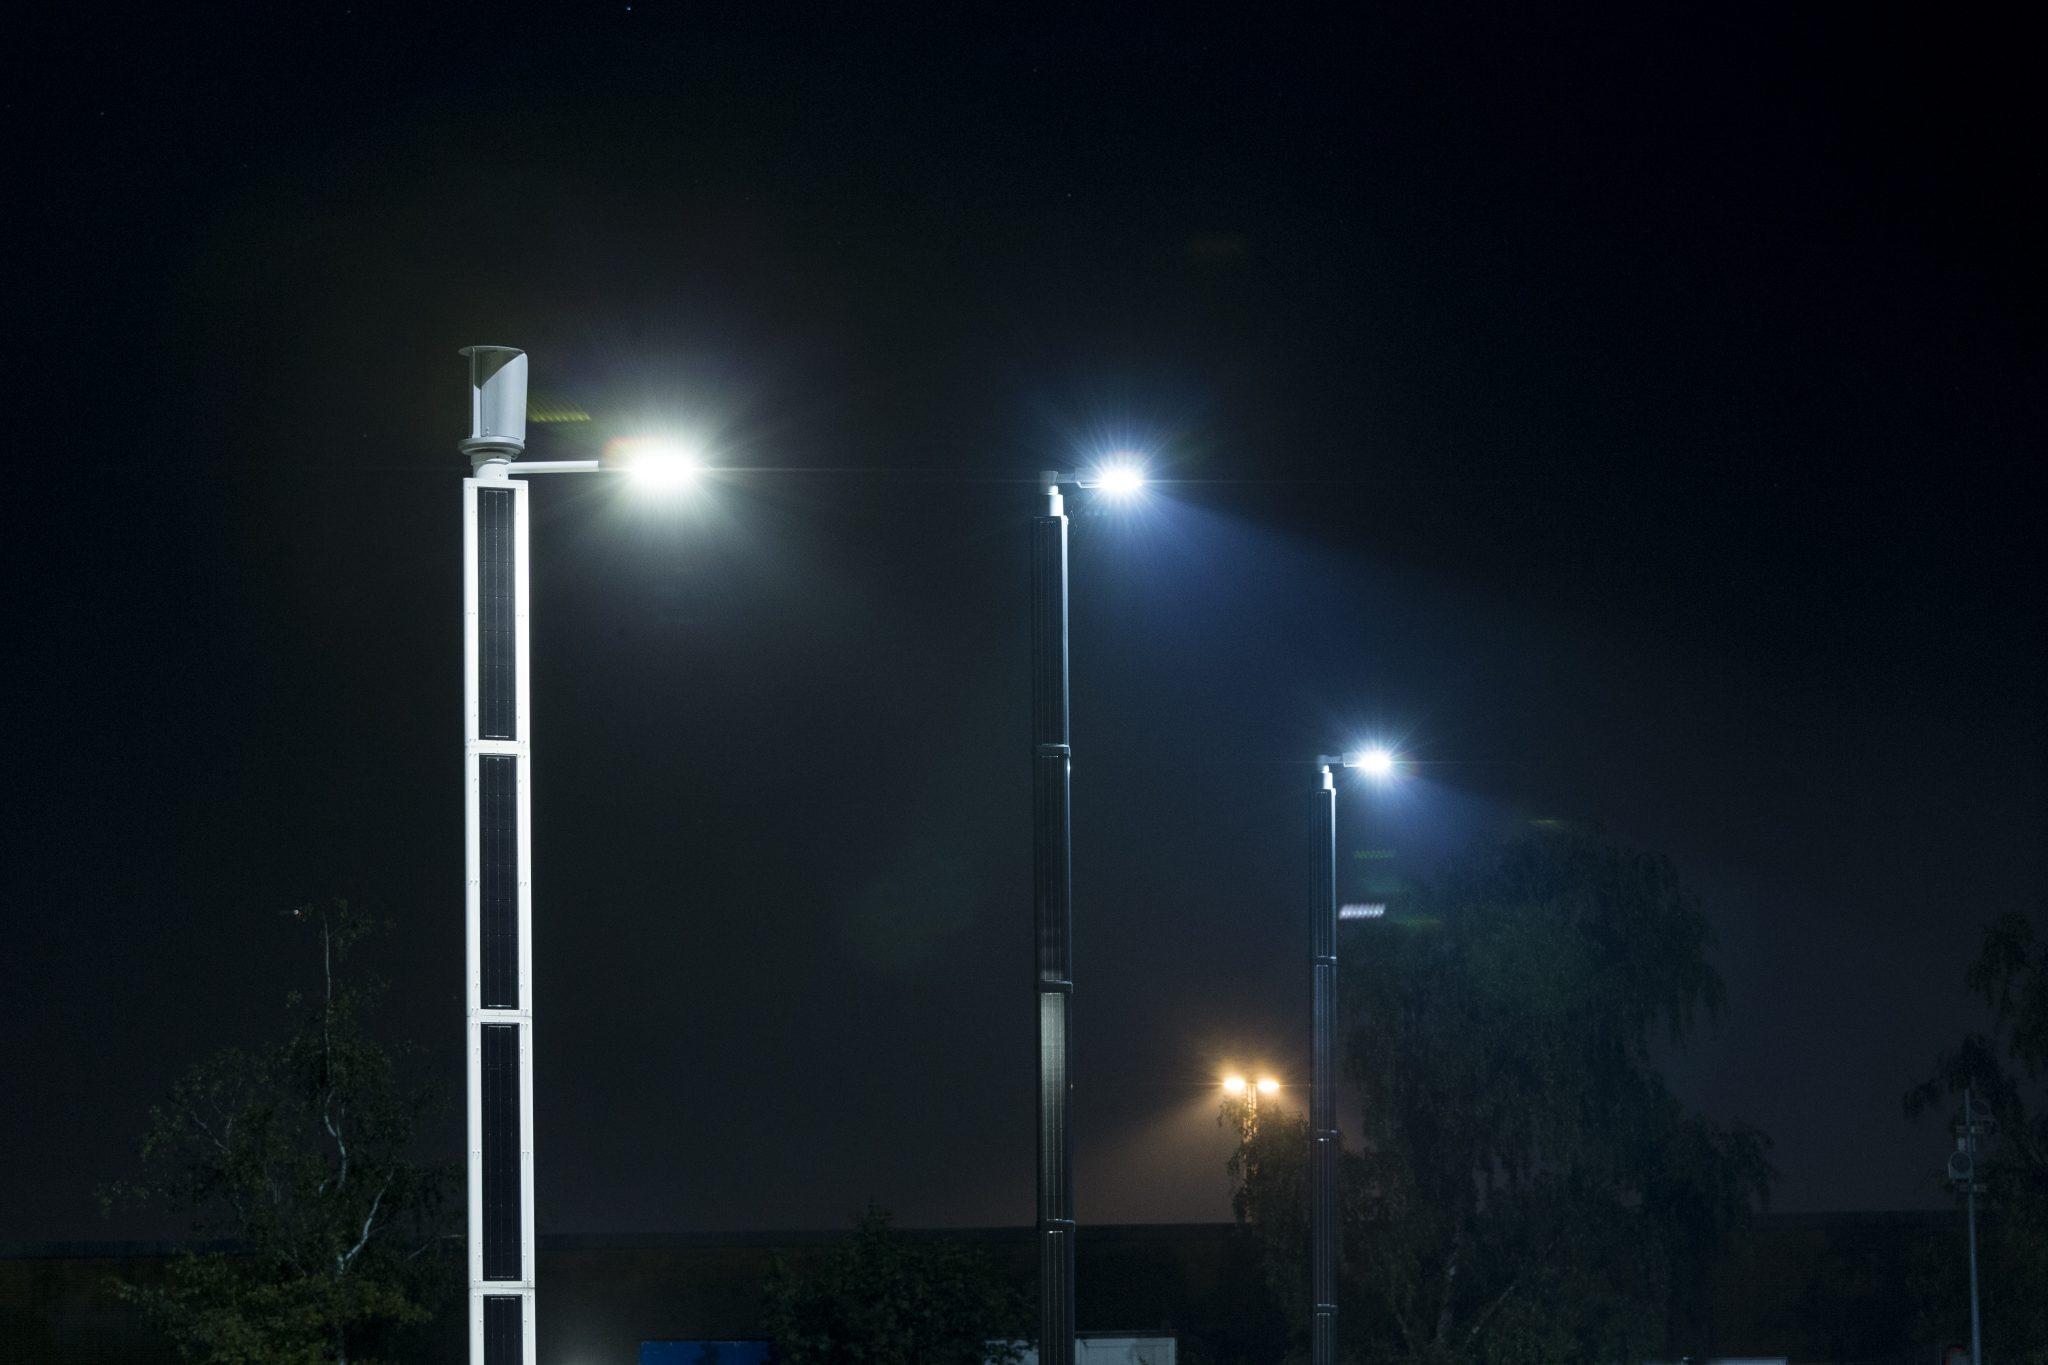 Luminaires in the DOLL Living Lab (picture Nicolai Perjesi, nicolaiperjesi.com)